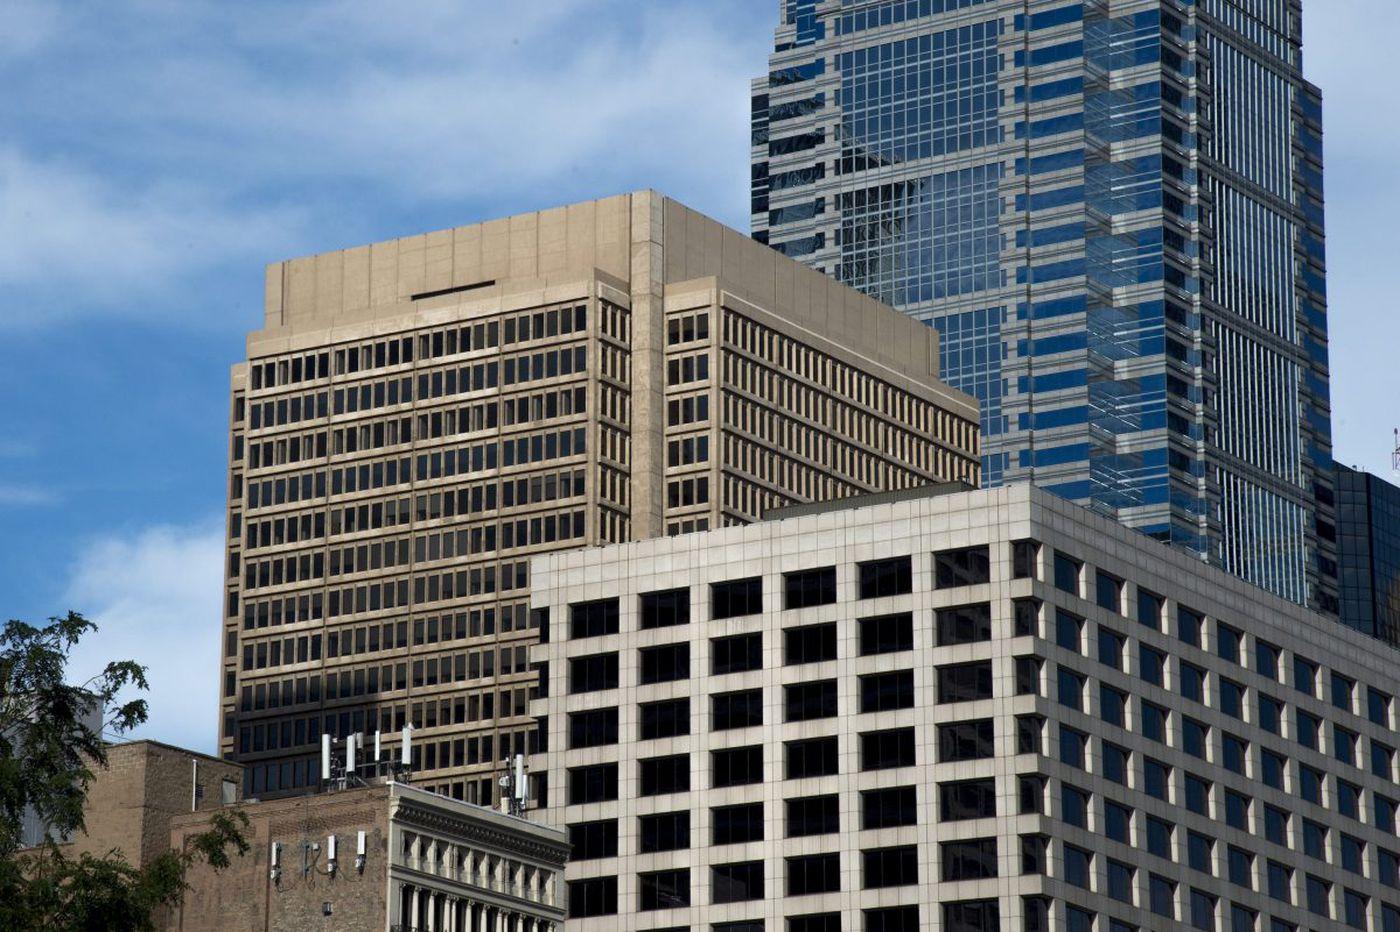 Life insurer Reliance Standard moves Center City HQ to 1700 Market St.